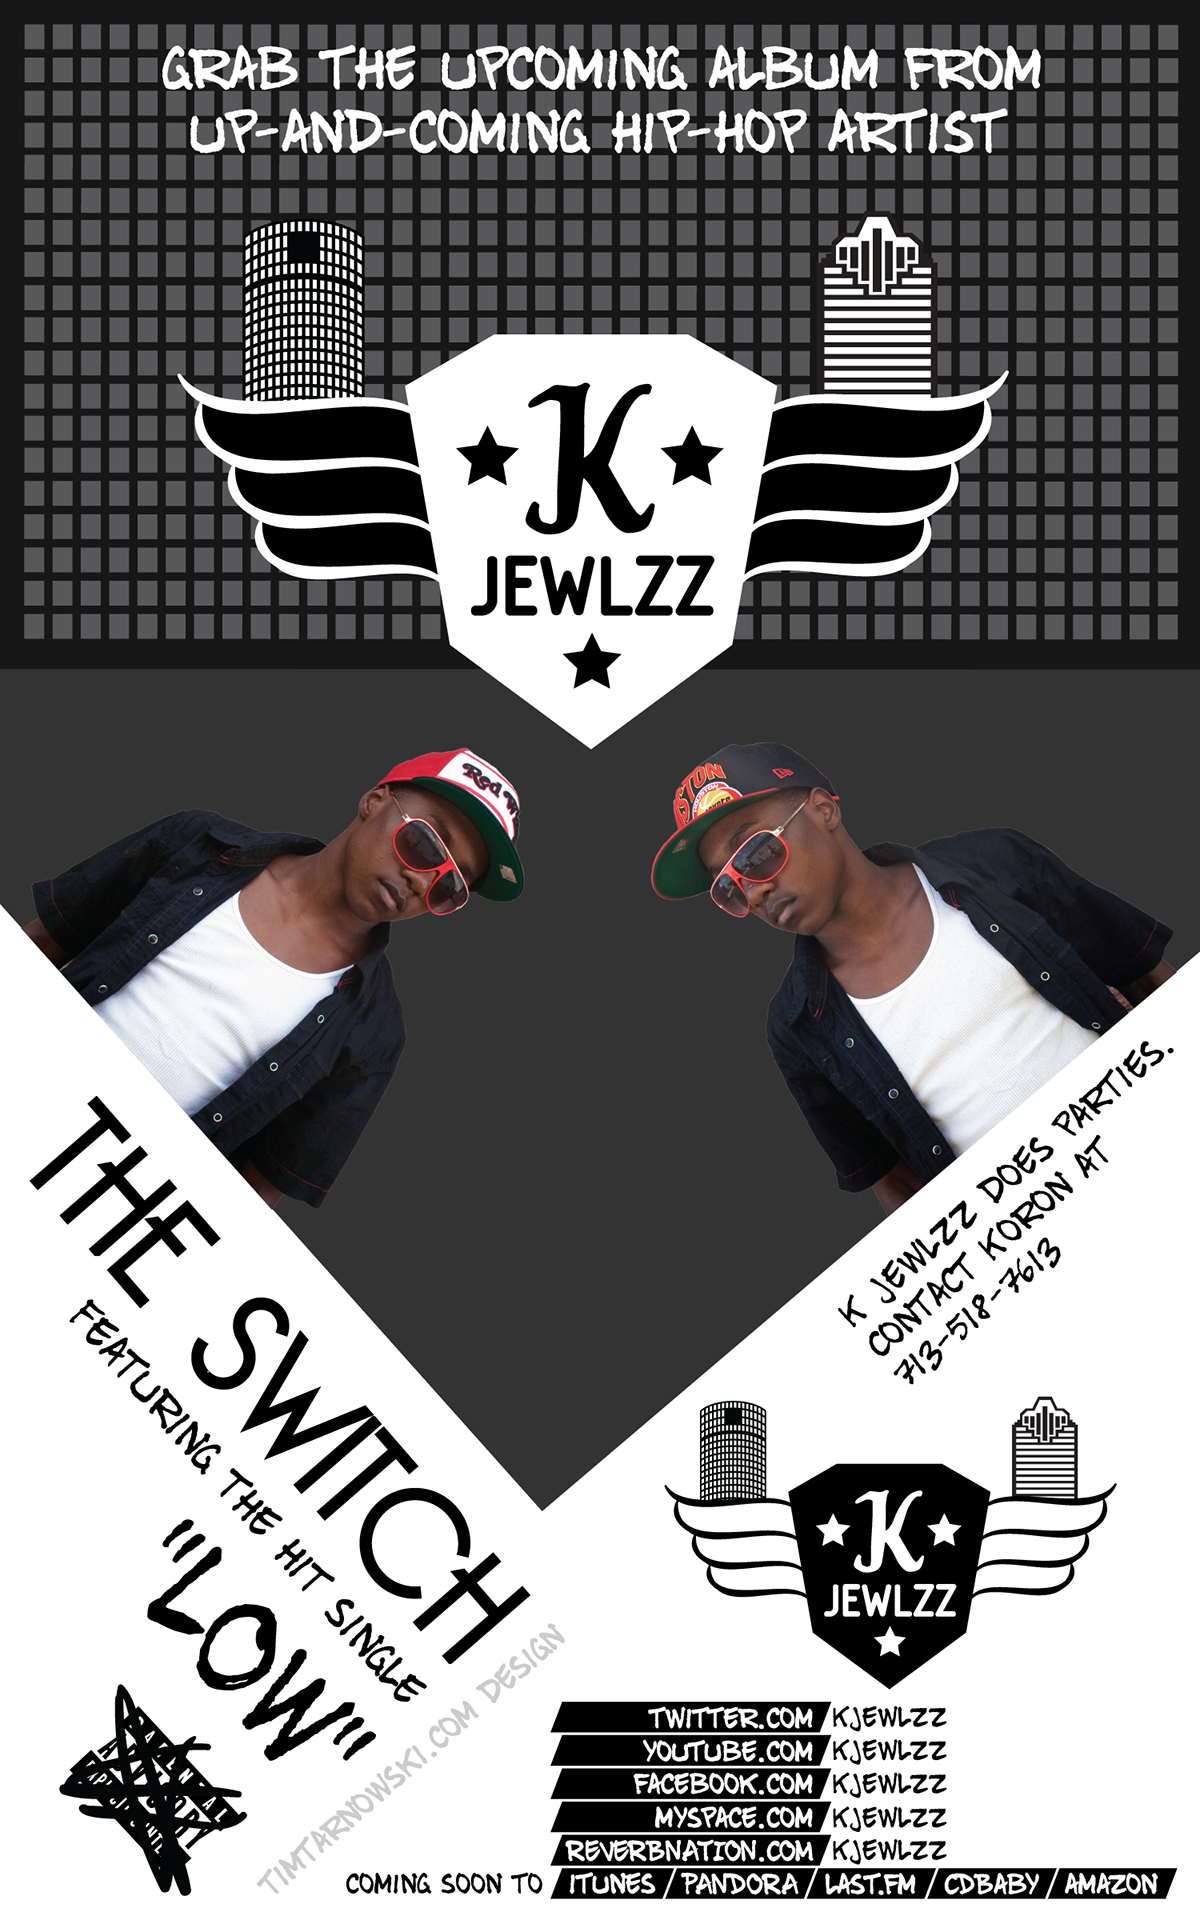 KJewlzz hip-hop hip hop logo poster Sunglasses hat